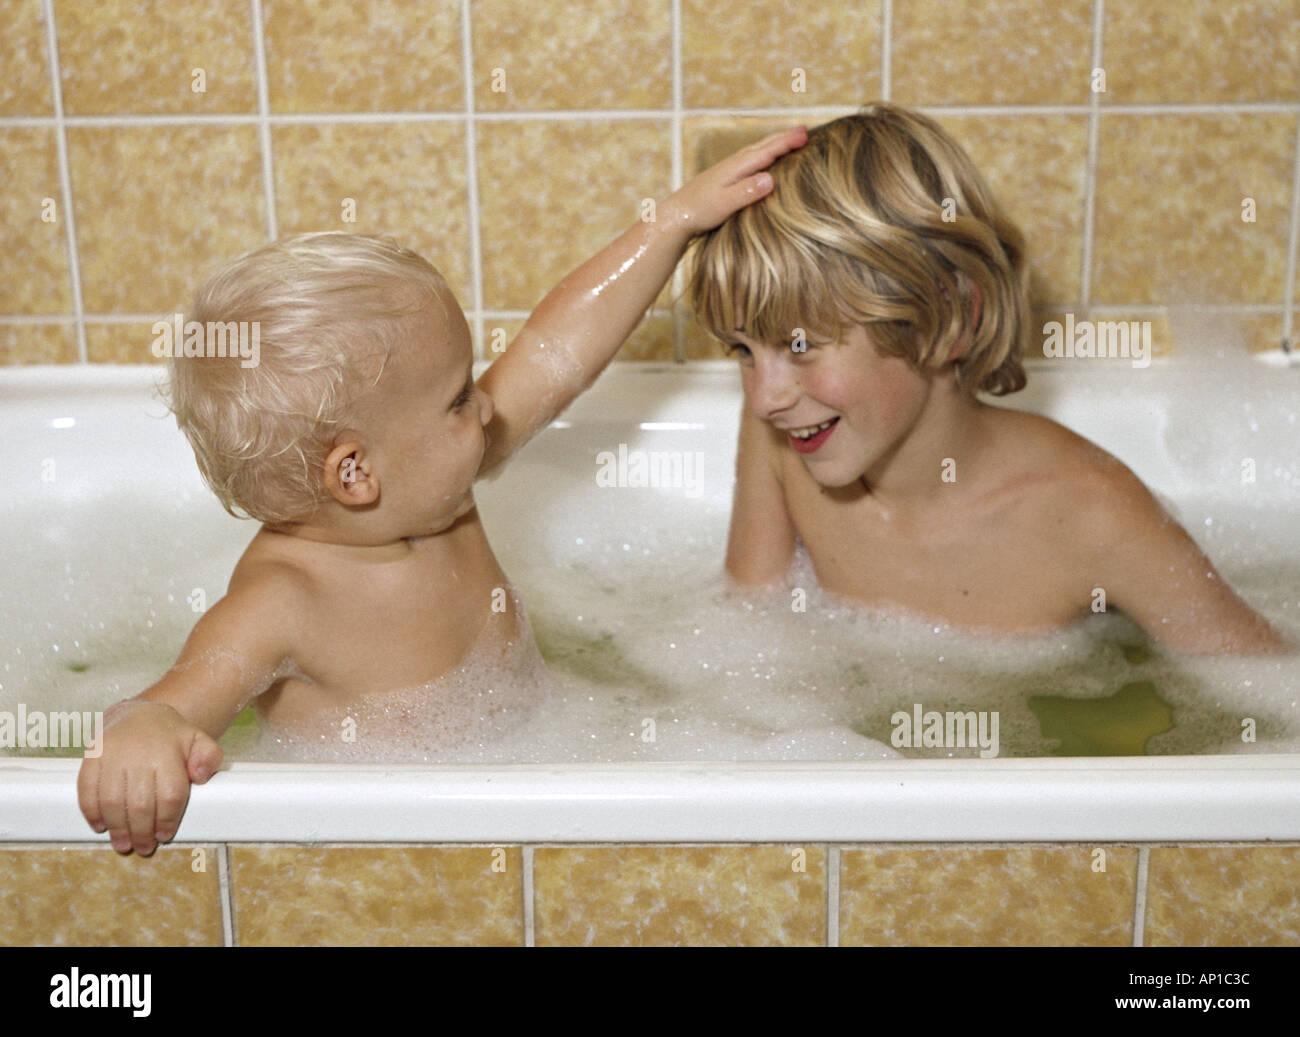 Naked Girls Bathing Together